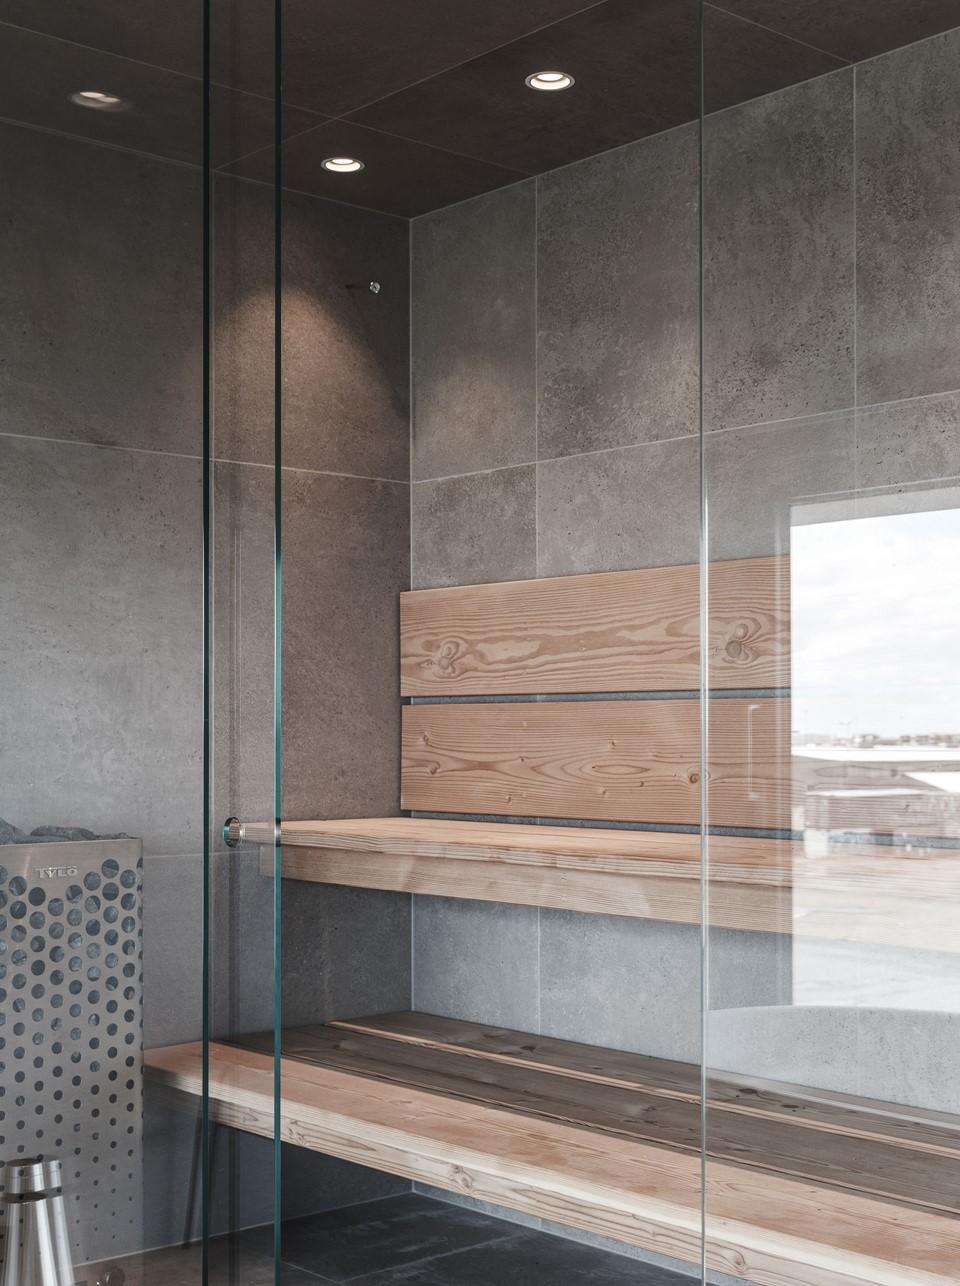 douglas_the-krane-copenhagen_sauna_dinesen_02.jpg